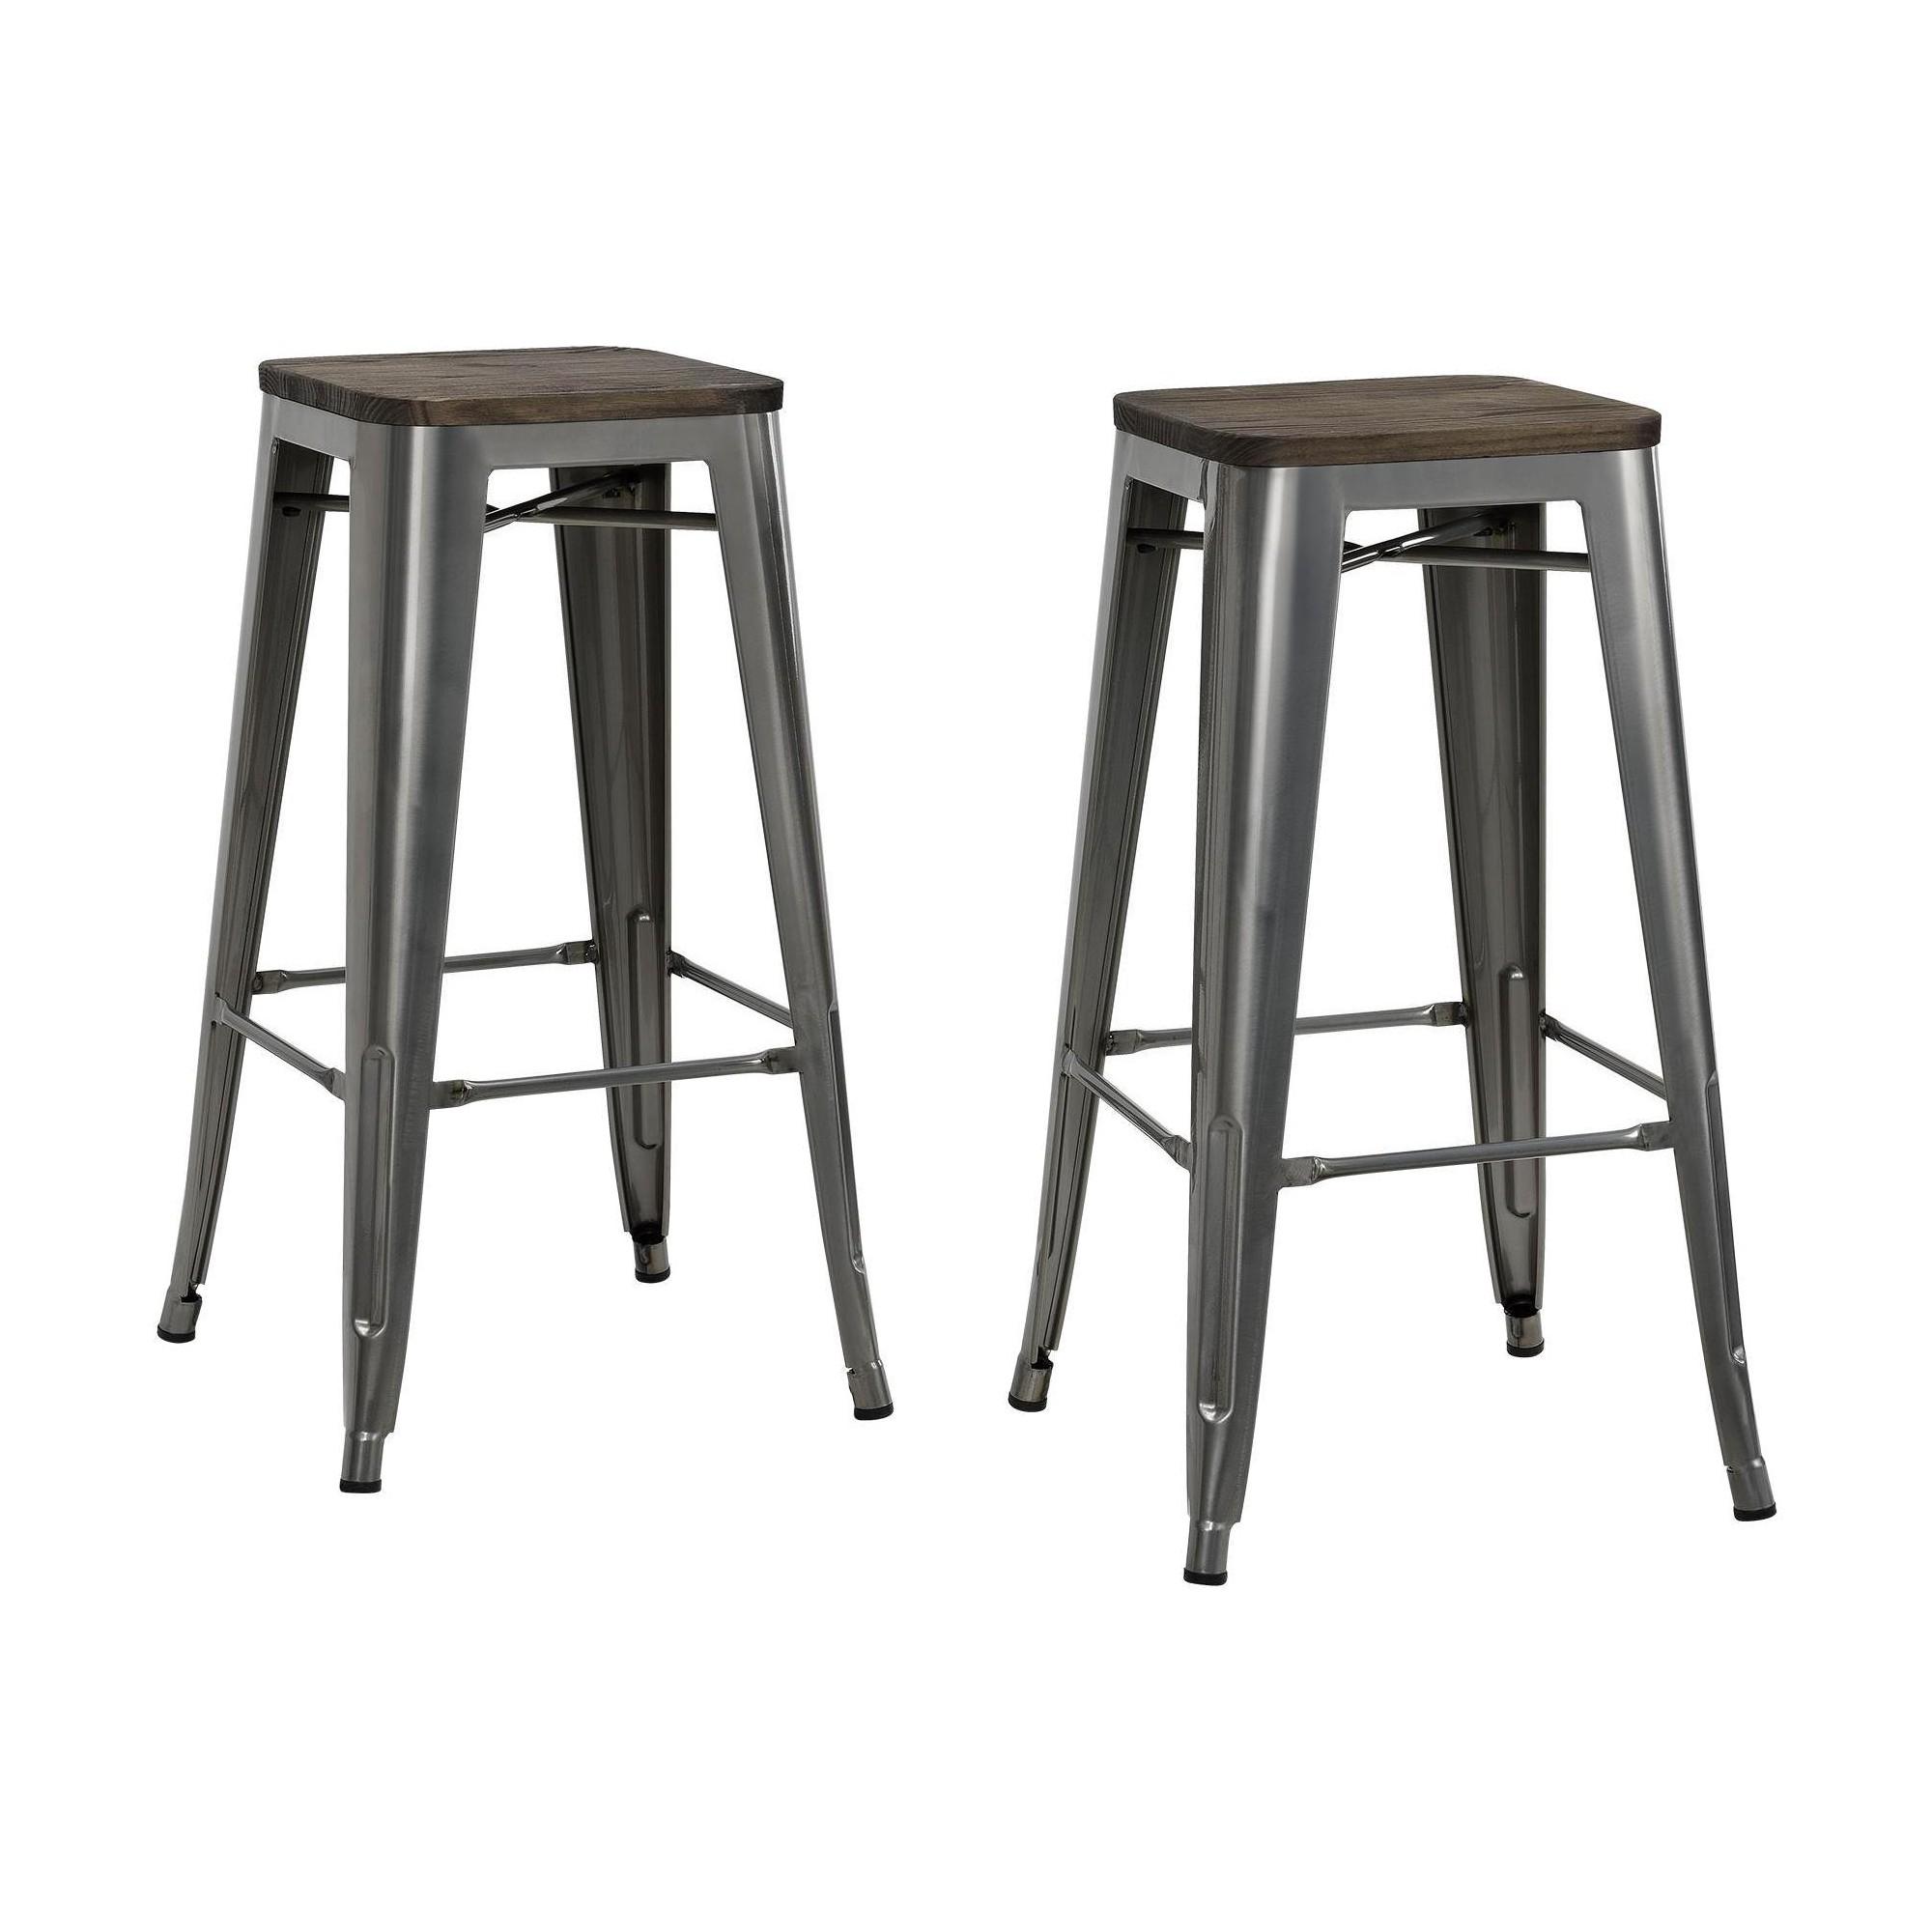 Awe Inspiring 30 Fusion Metal Backless Bar Stool With Wood Seat Set Of 2 Frankydiablos Diy Chair Ideas Frankydiabloscom